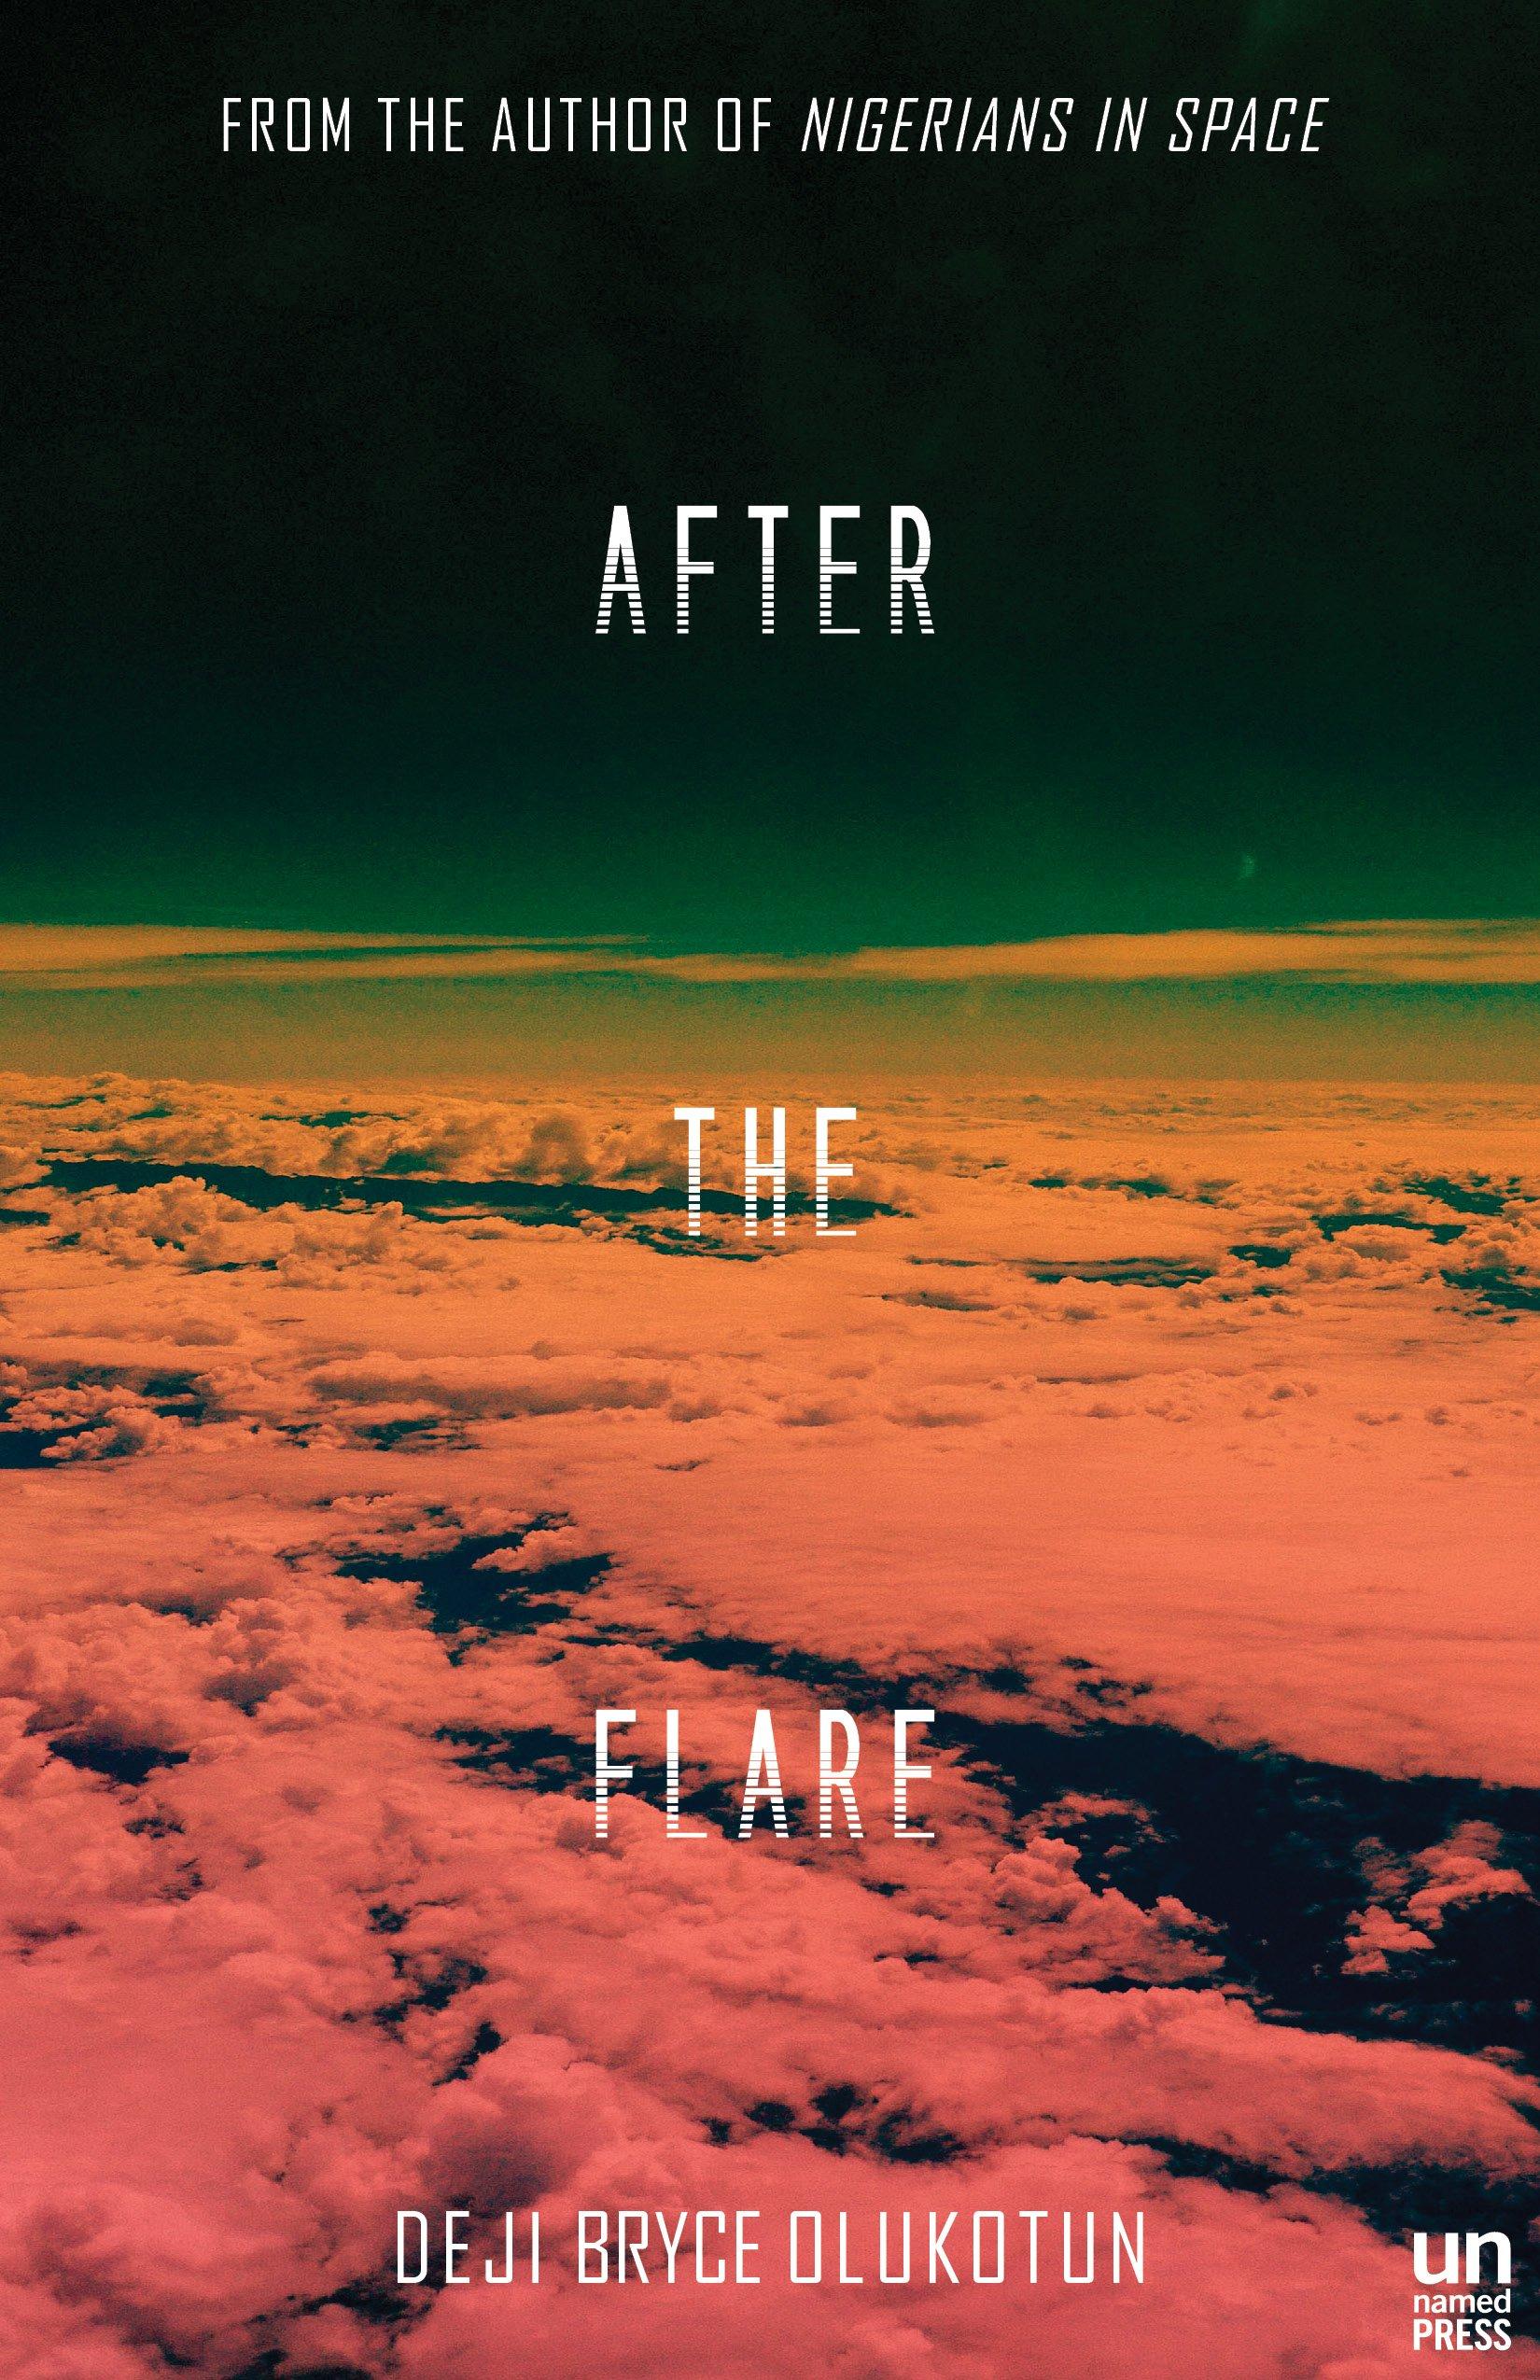 After the Flare: A Novel (Nigerians in Space): Olukotun, Deji Bryce:  9781944700188: Amazon.com: Books